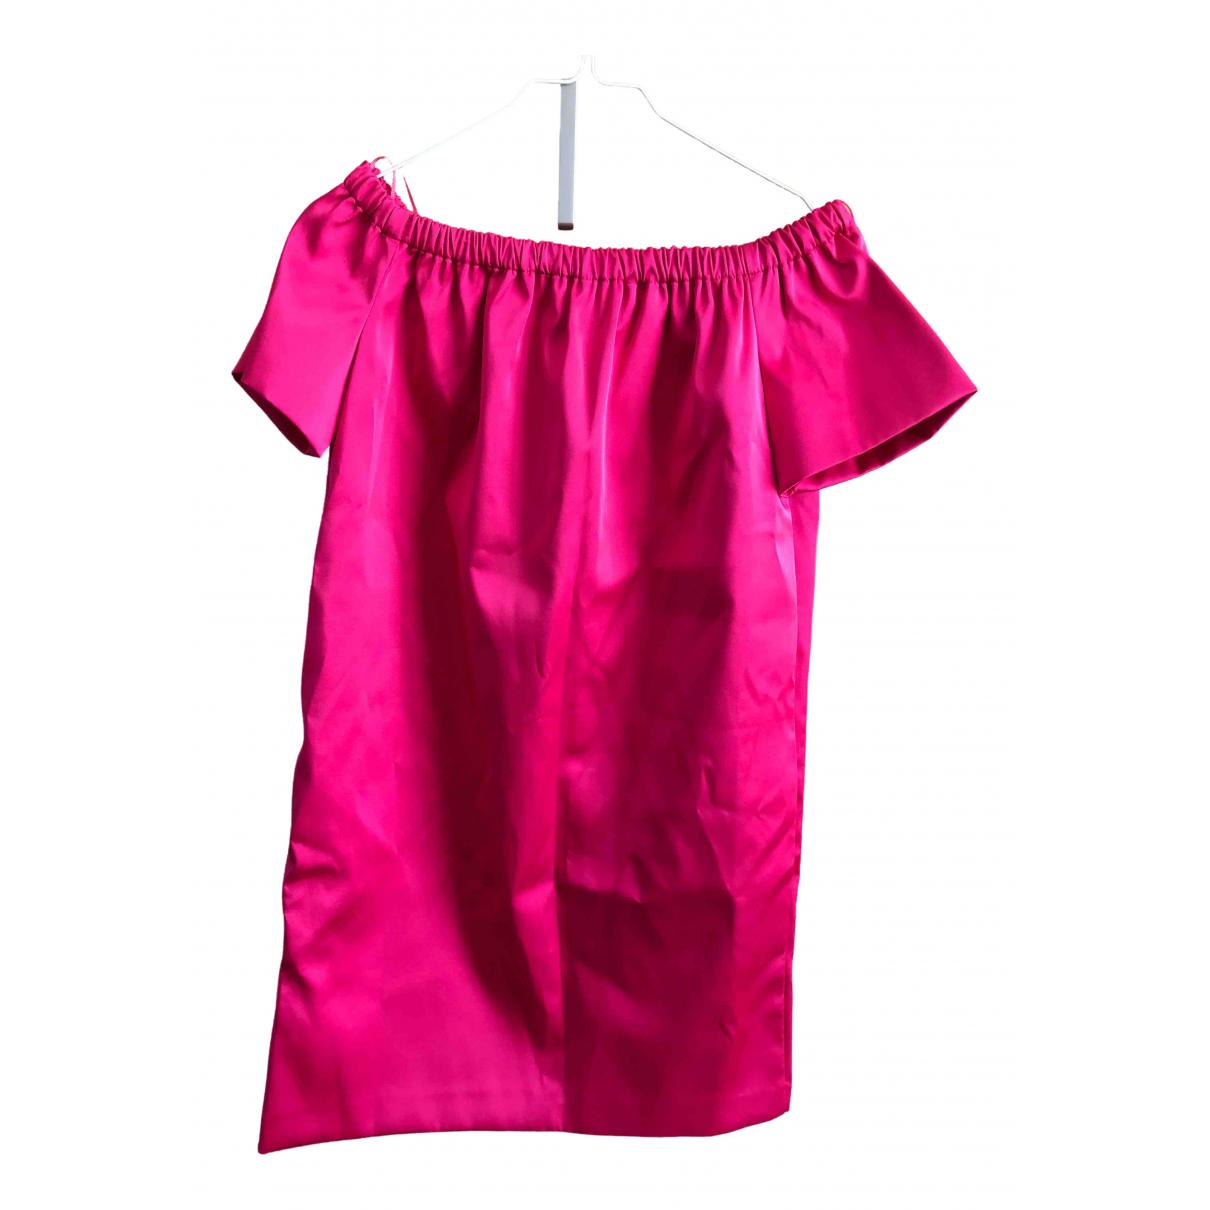 Maje \N Pink dress for Women 36 FR